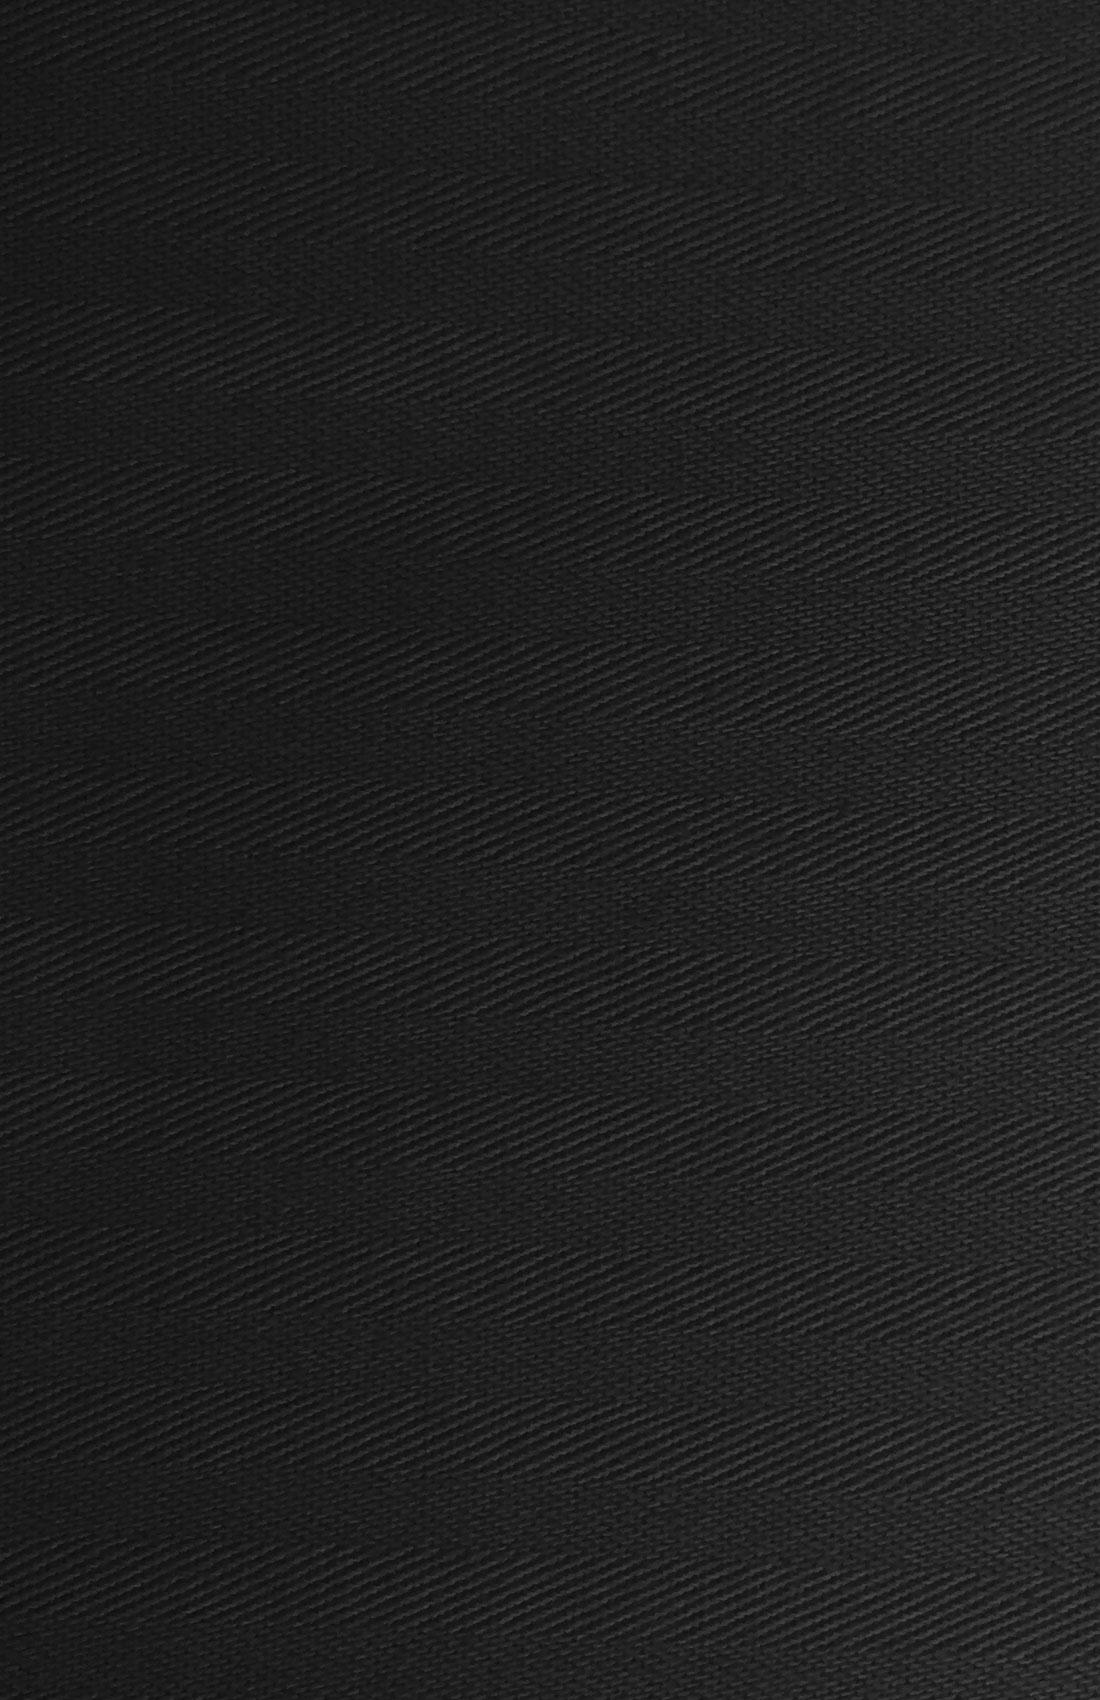 korsett mieder stoff cotton coutil 100 baumwolle meterware ebay. Black Bedroom Furniture Sets. Home Design Ideas